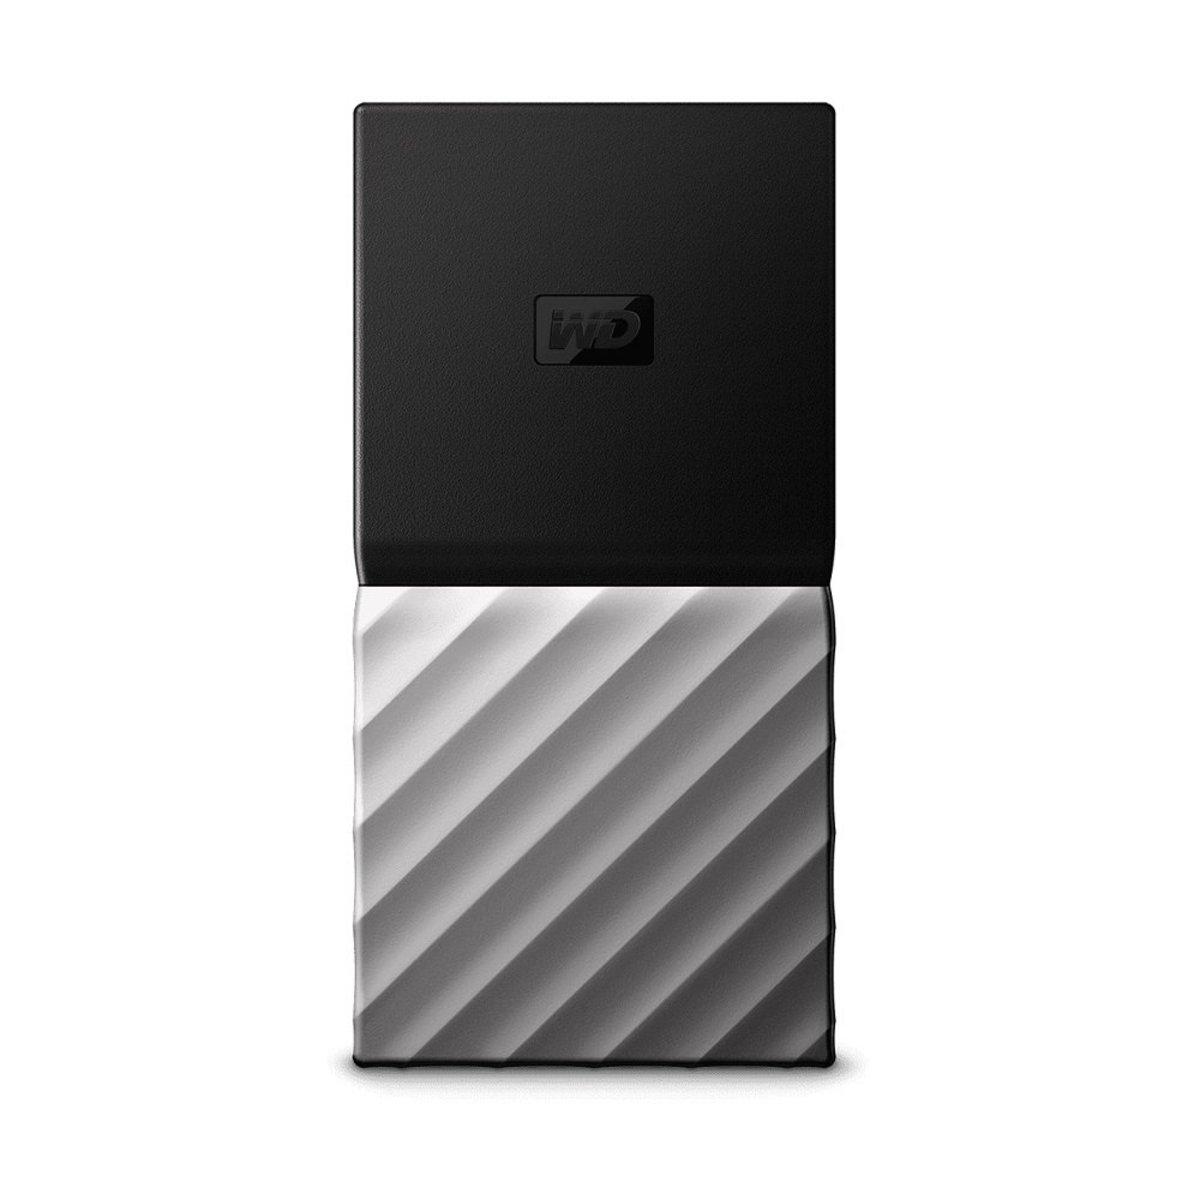 My Passport SSD 512GB Portable HardDisk